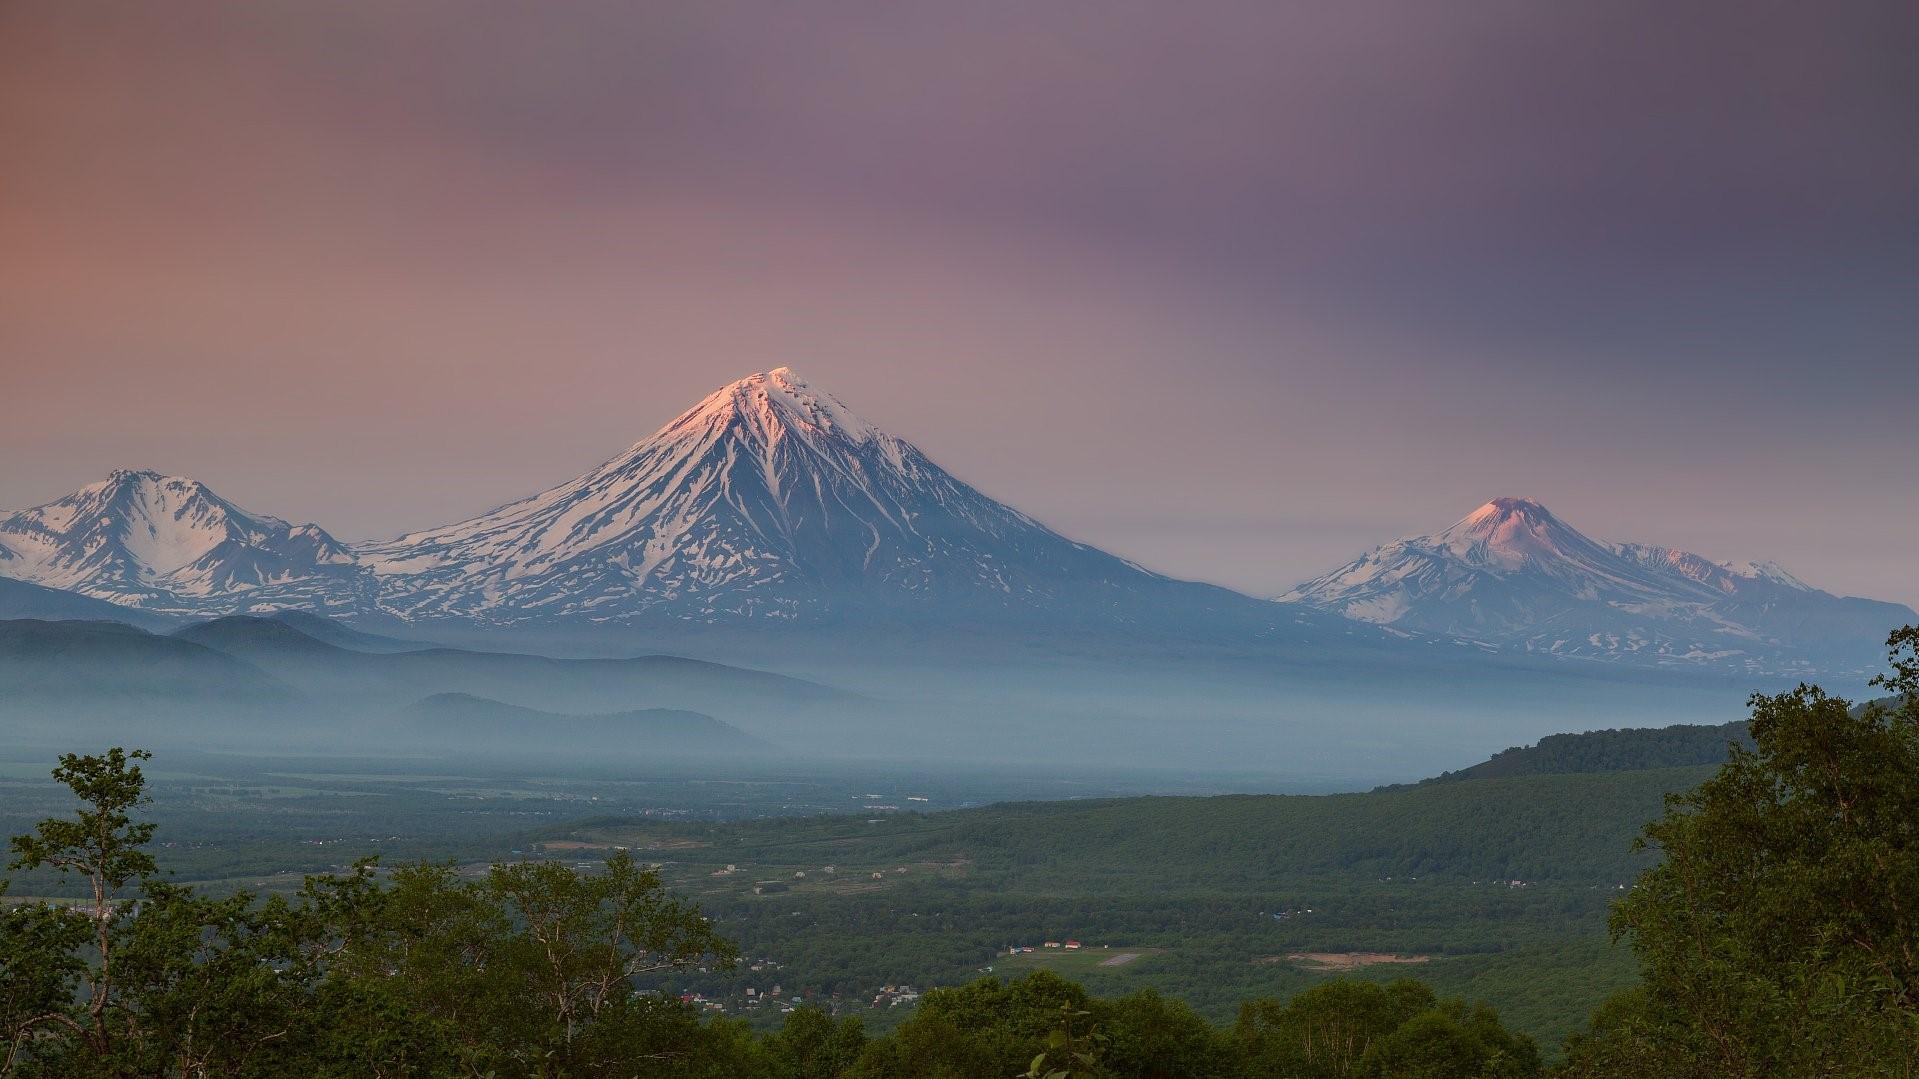 Koryaksky and Avachinsky volcanoes